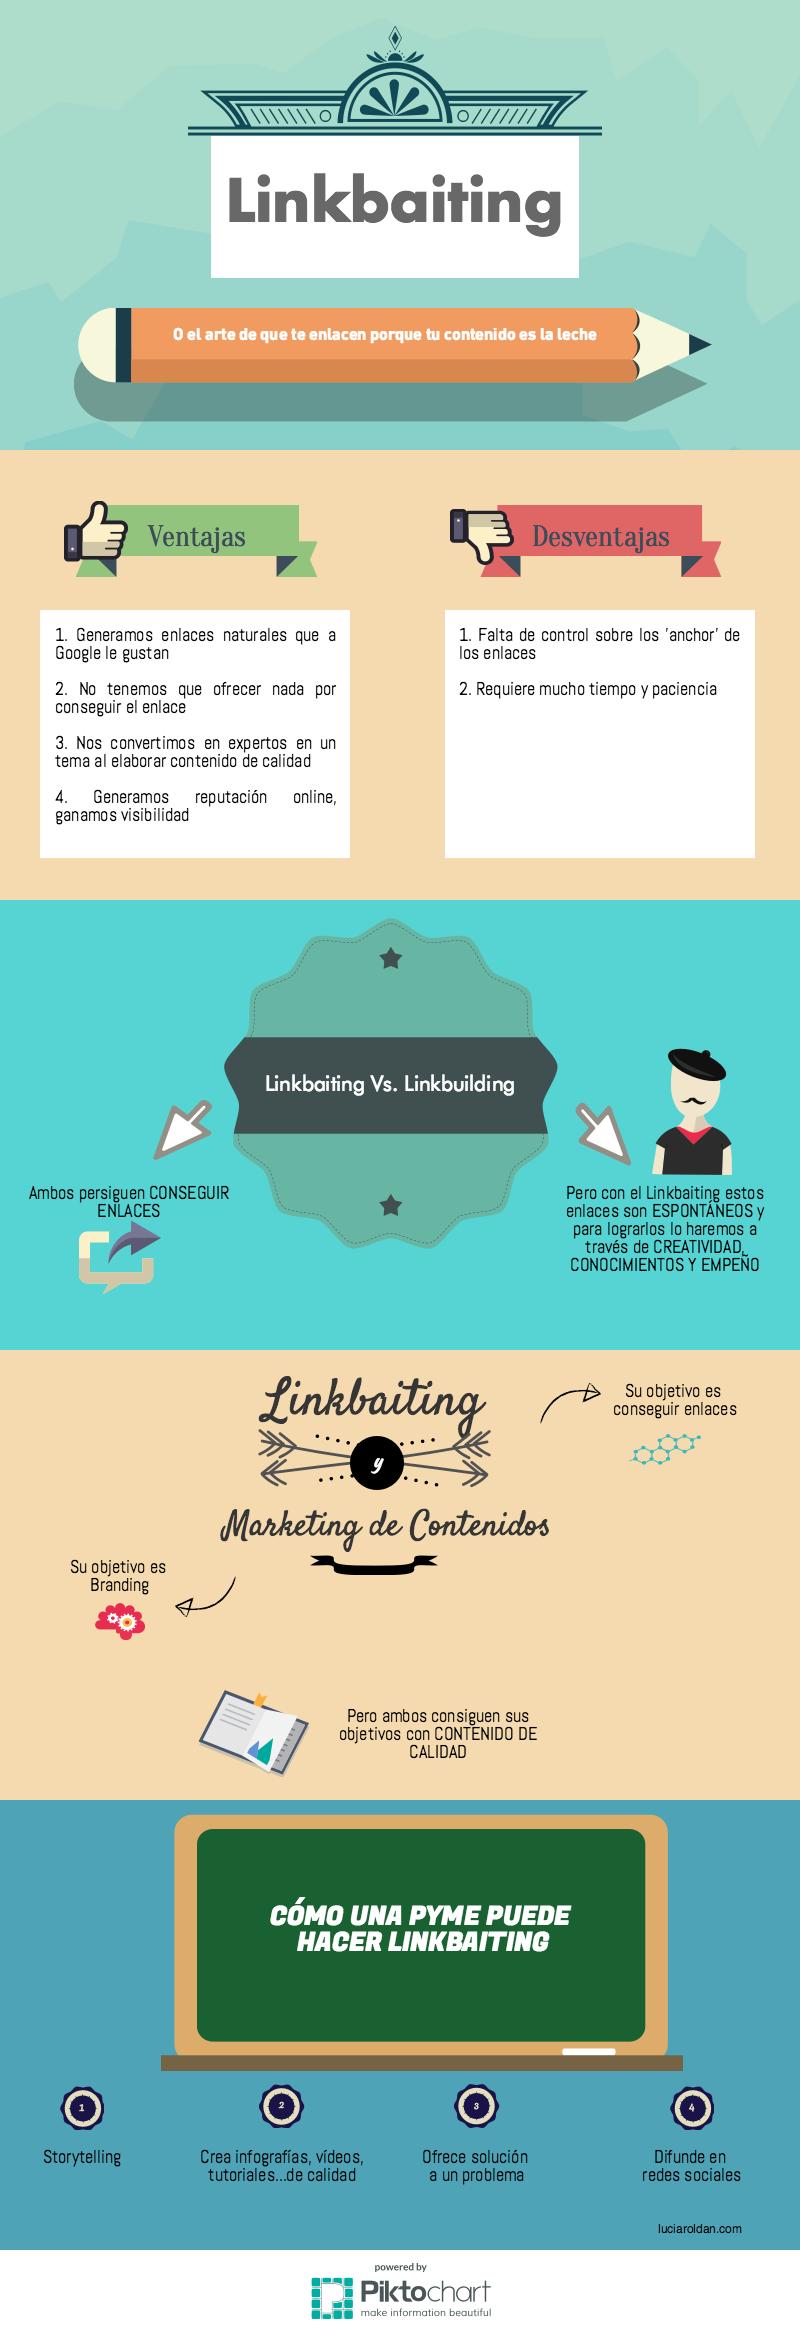 infografia-linkbaiting